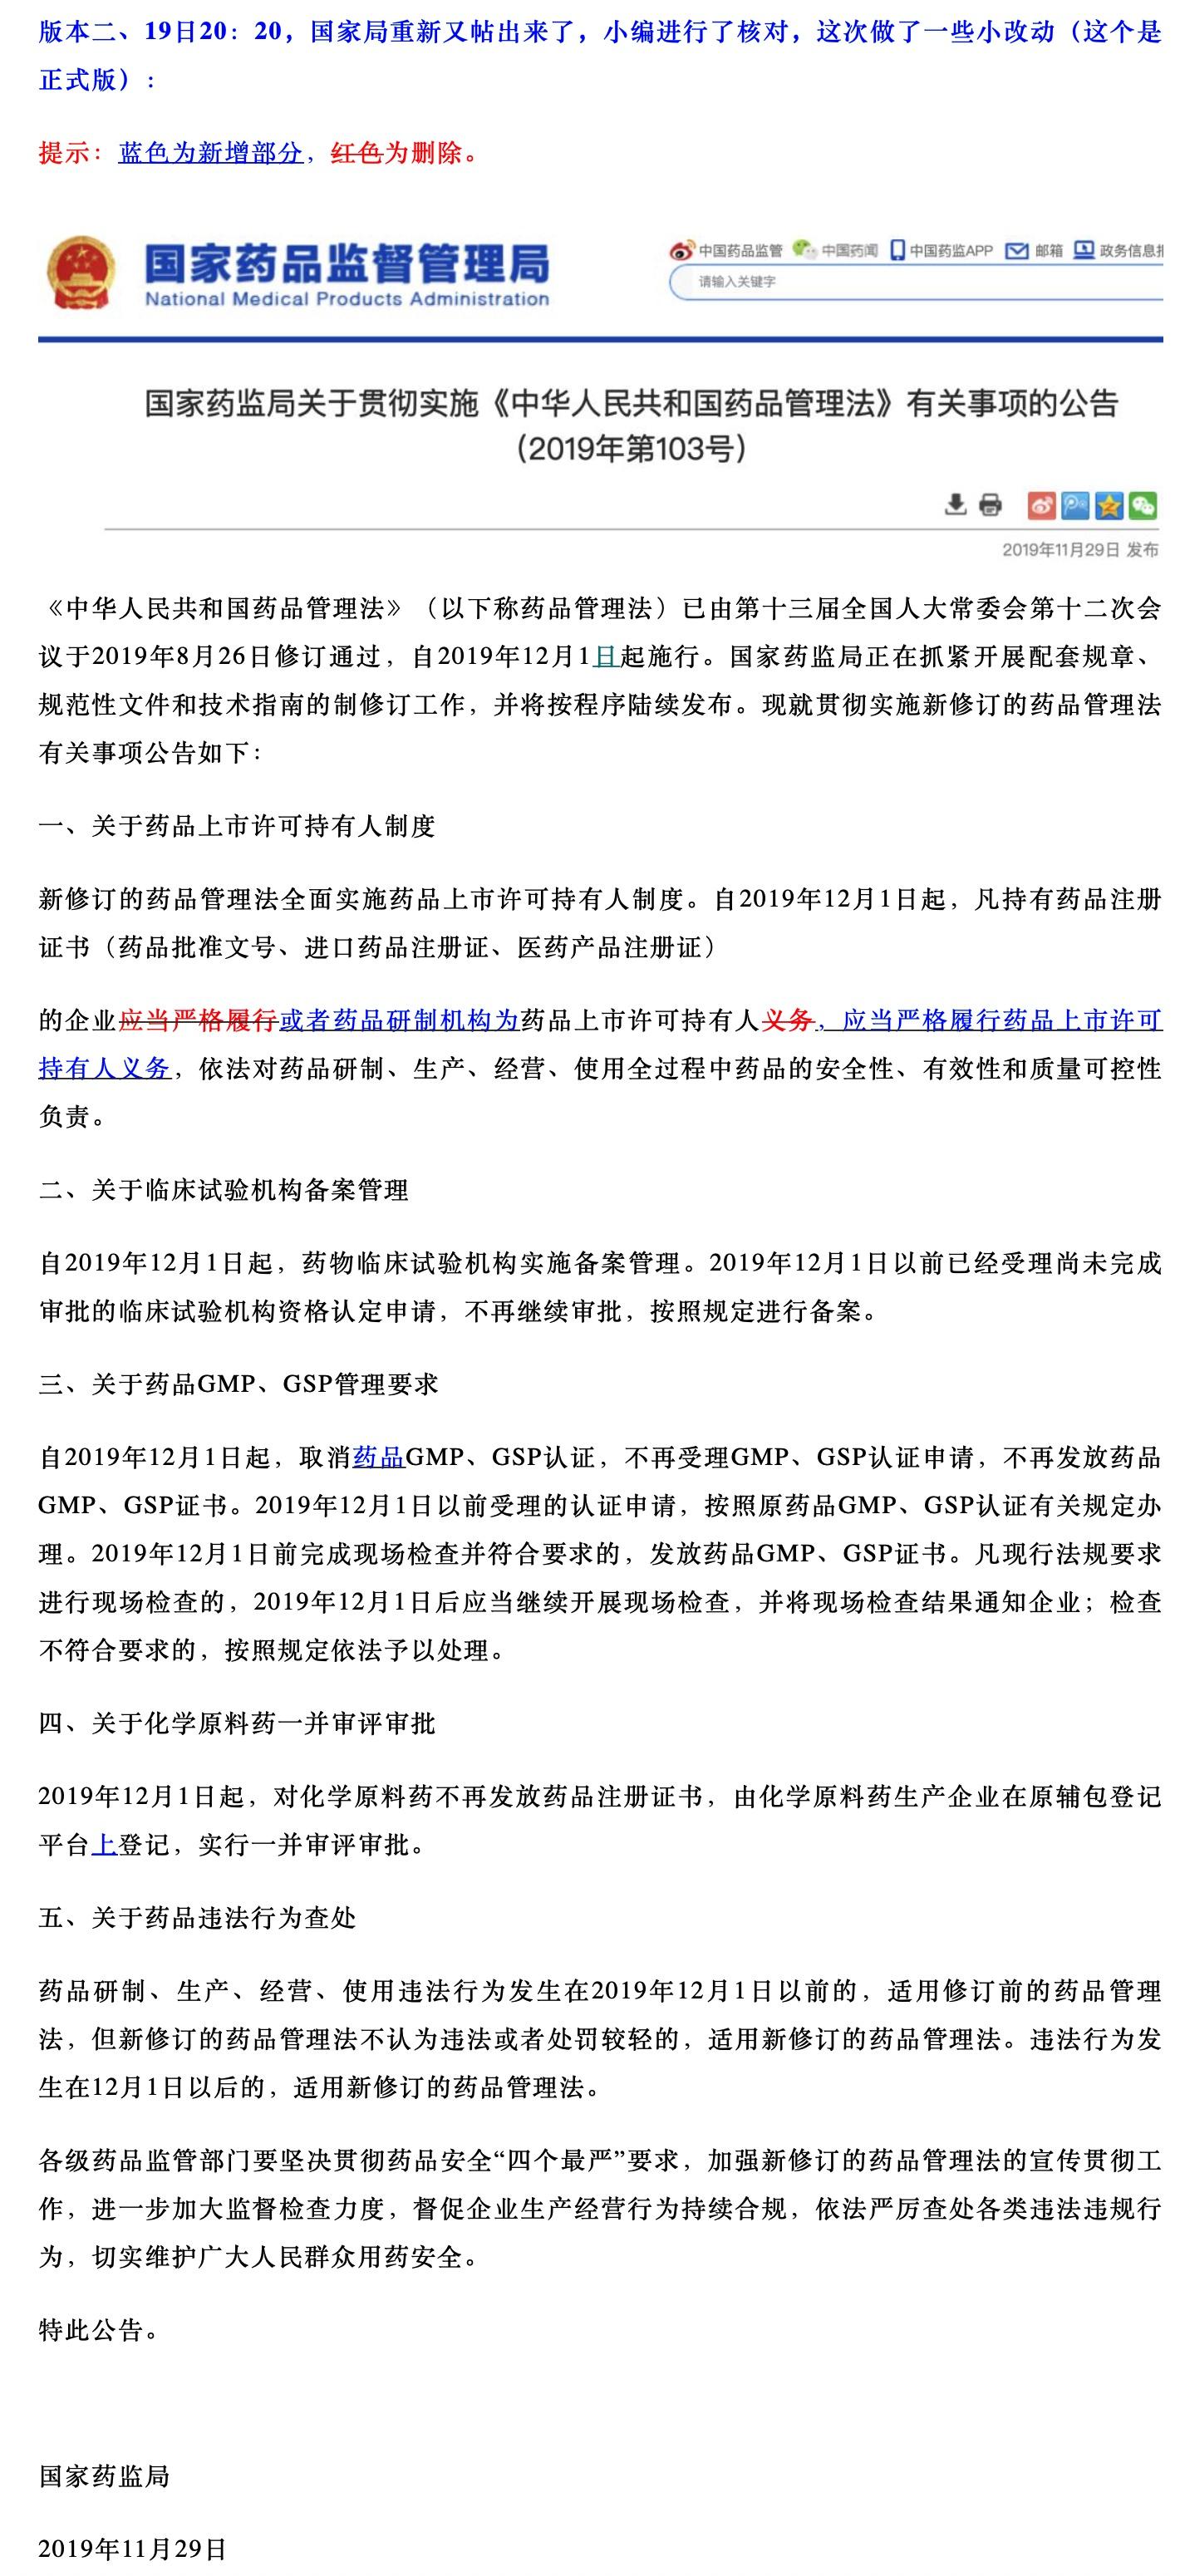 Xnip2019-11-29_20-27-04.jpg